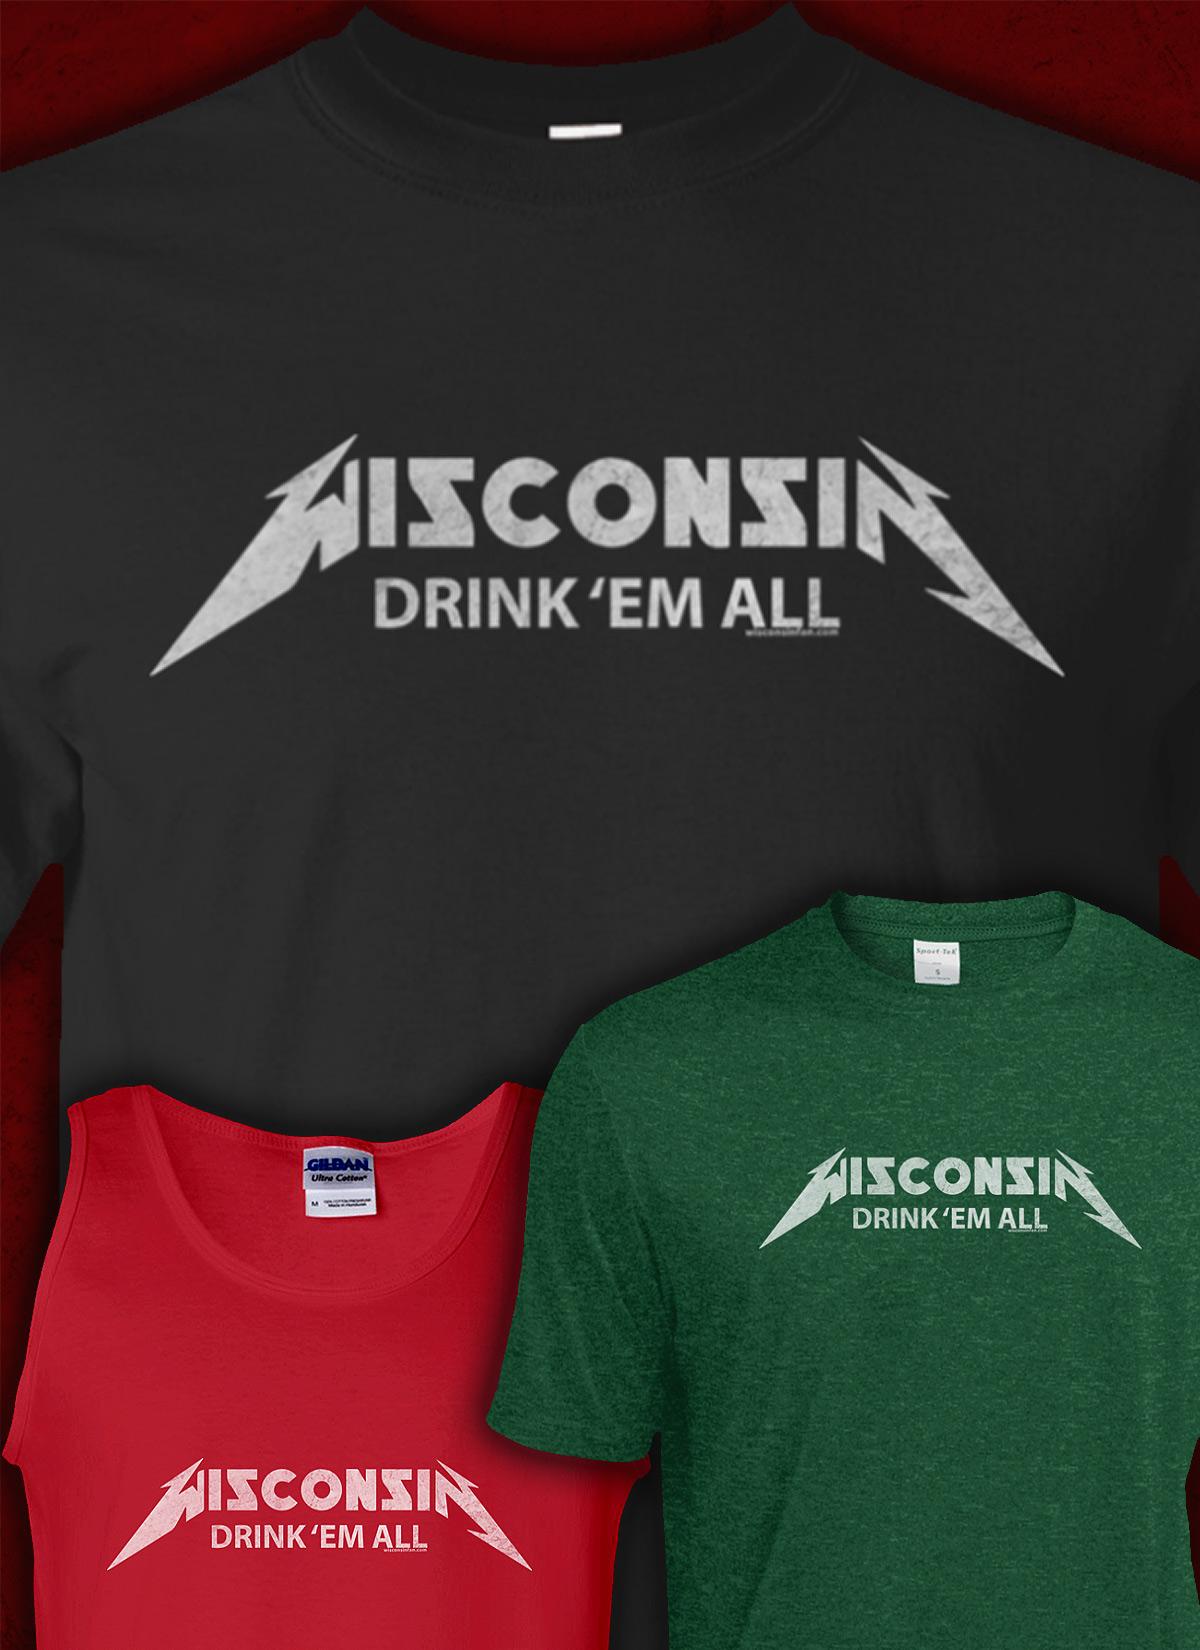 wisconsin-drink-em-all-mens-tshirt-tank